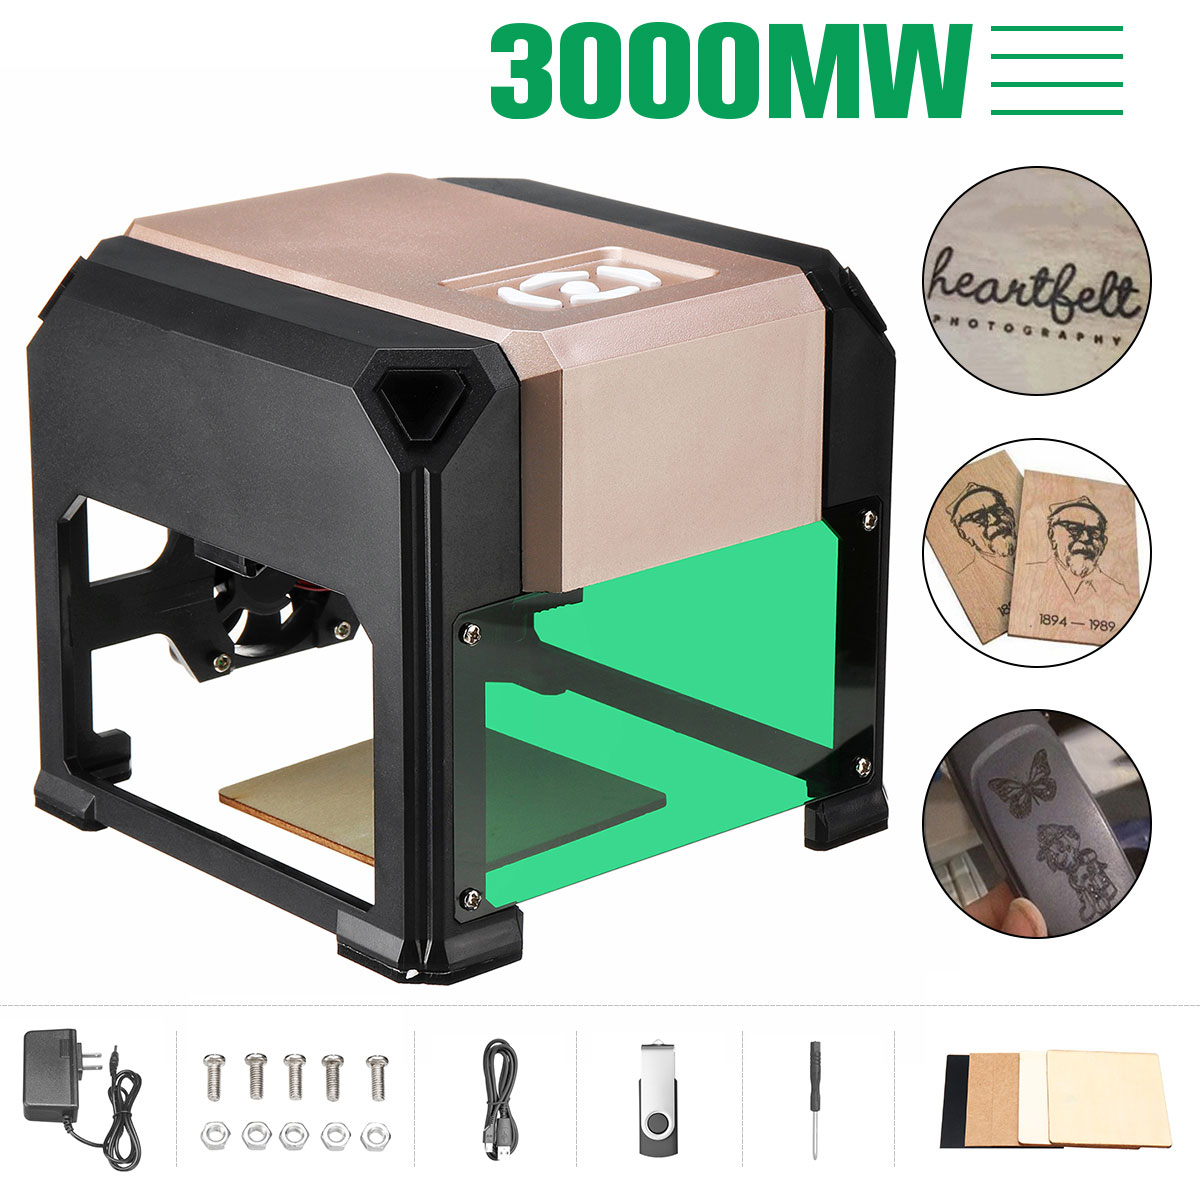 Upgrade 3000MW Desktop Laser Engraving Machine Logo Marking FOR WIN/Mac OS System Wood Router CNC Laser Carving Machine цены